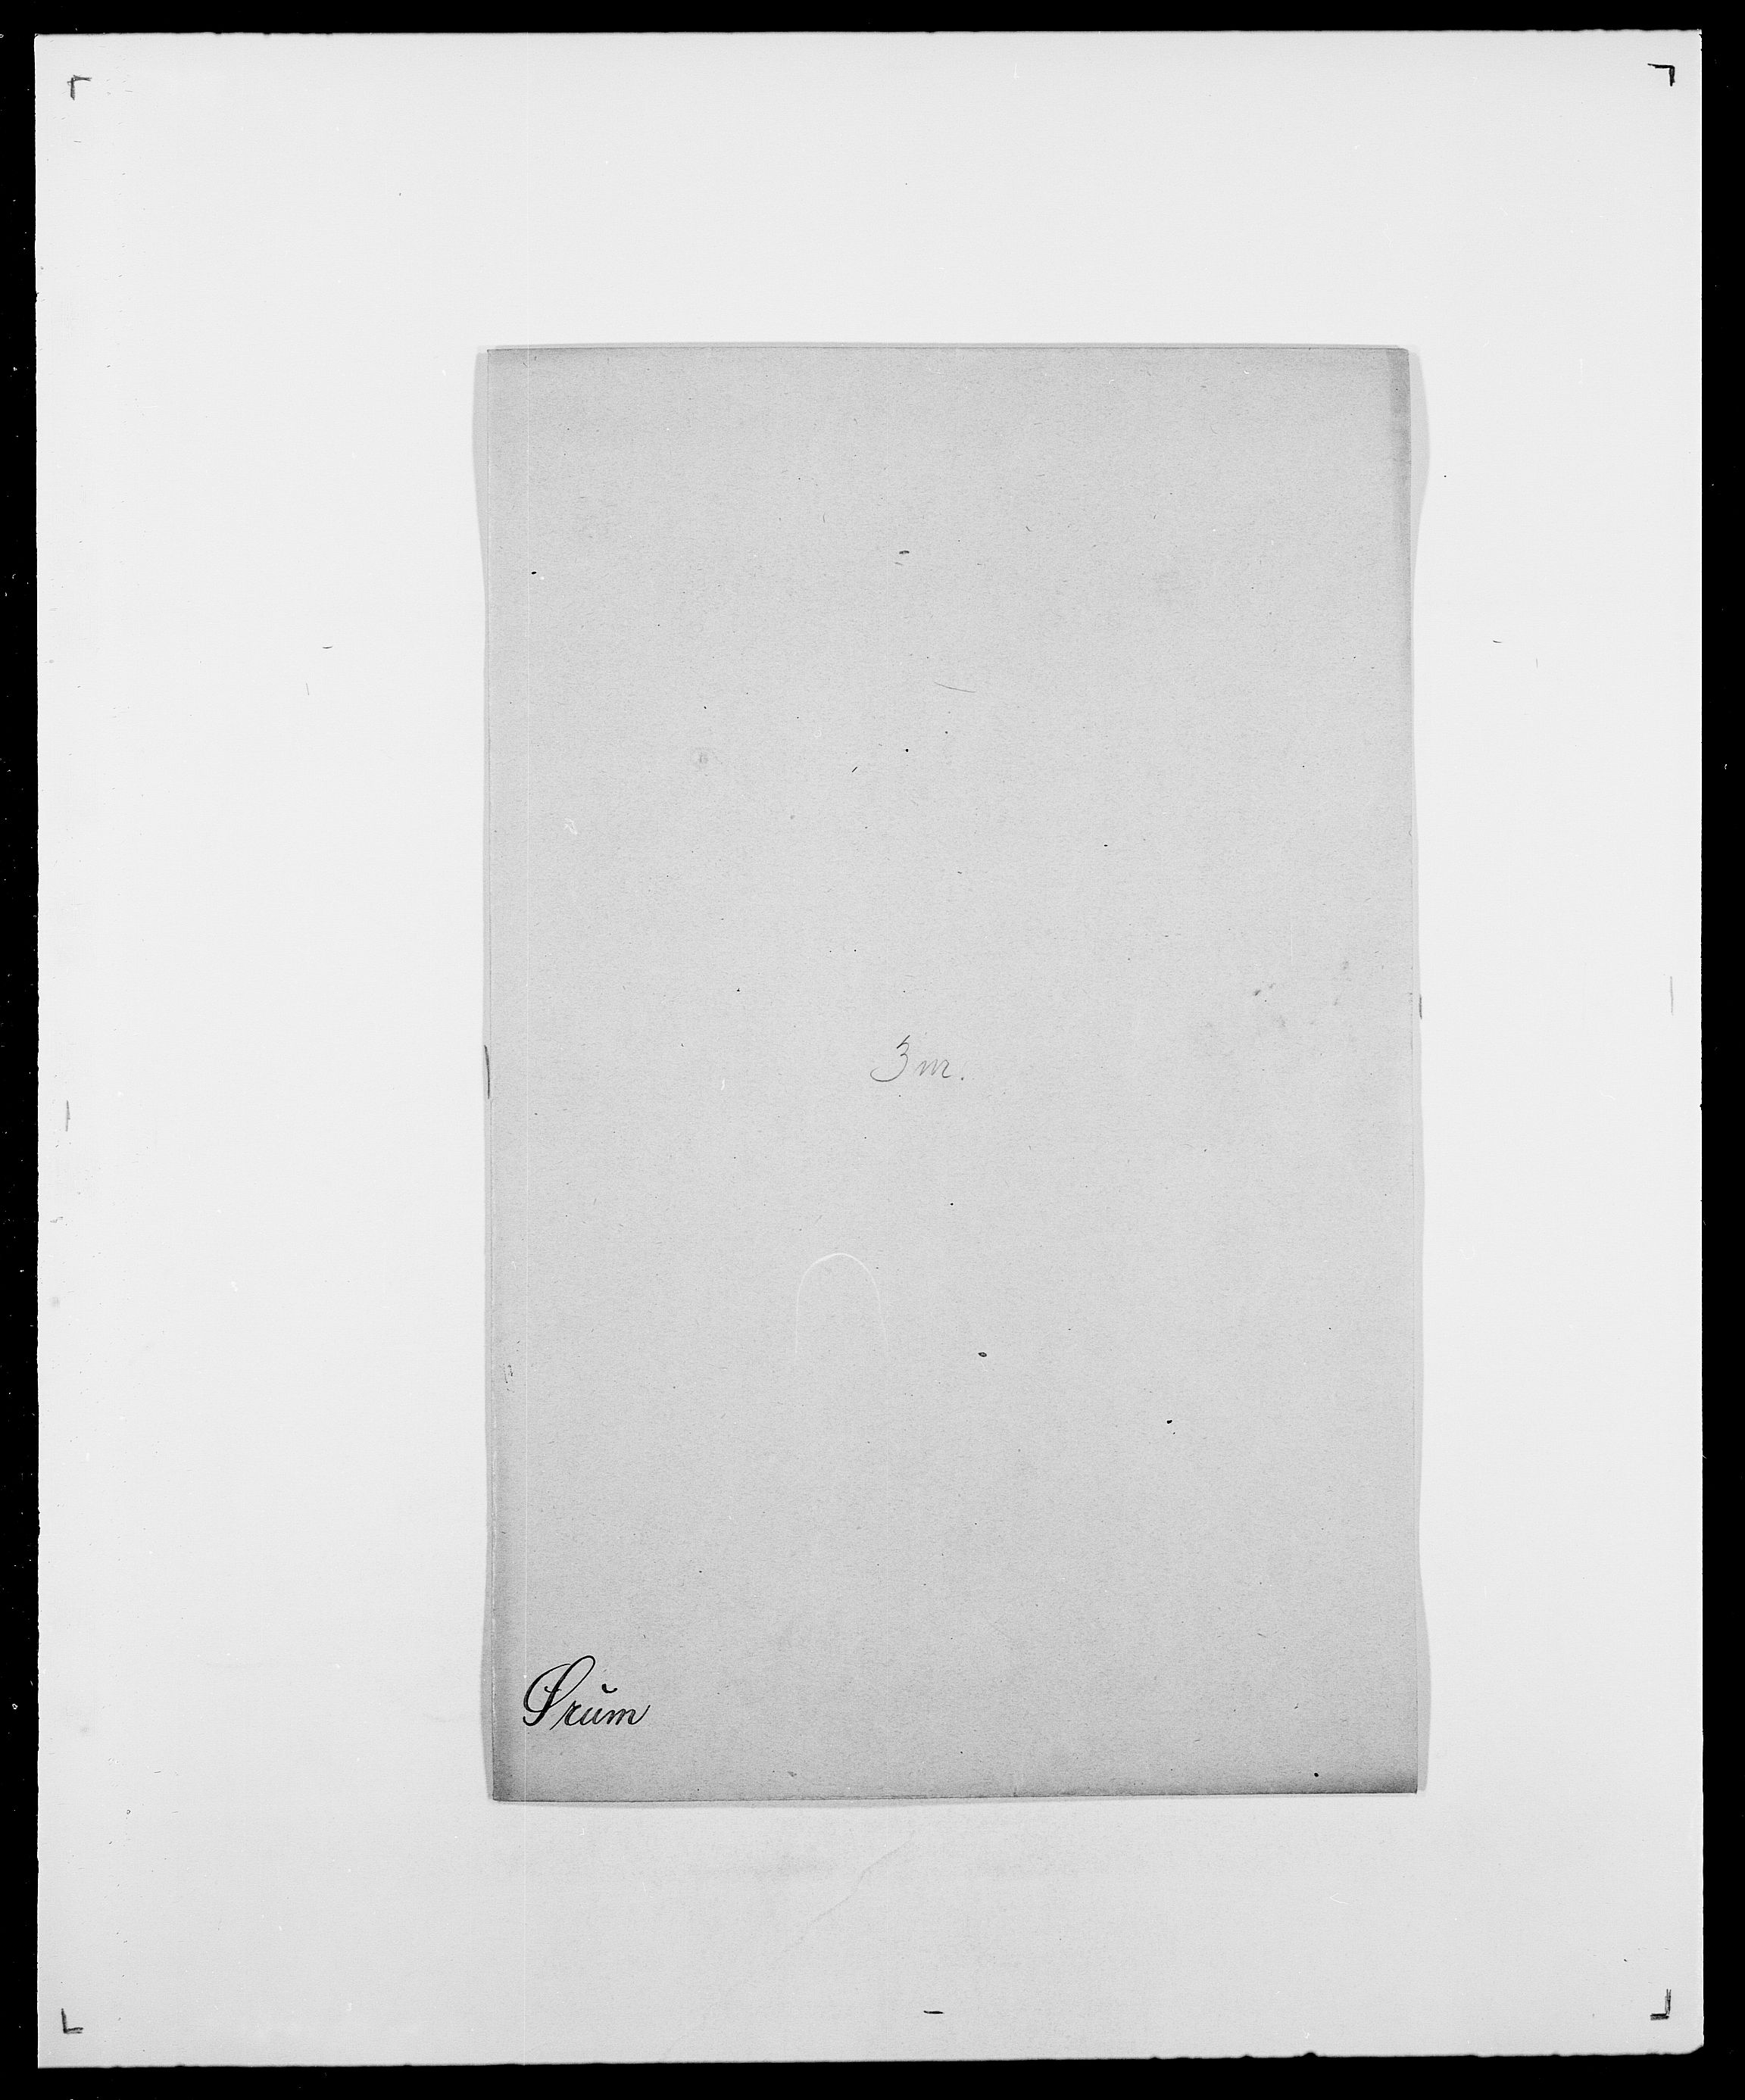 SAO, Delgobe, Charles Antoine - samling, D/Da/L0043: Wulfsberg - v. Zanten, s. 311